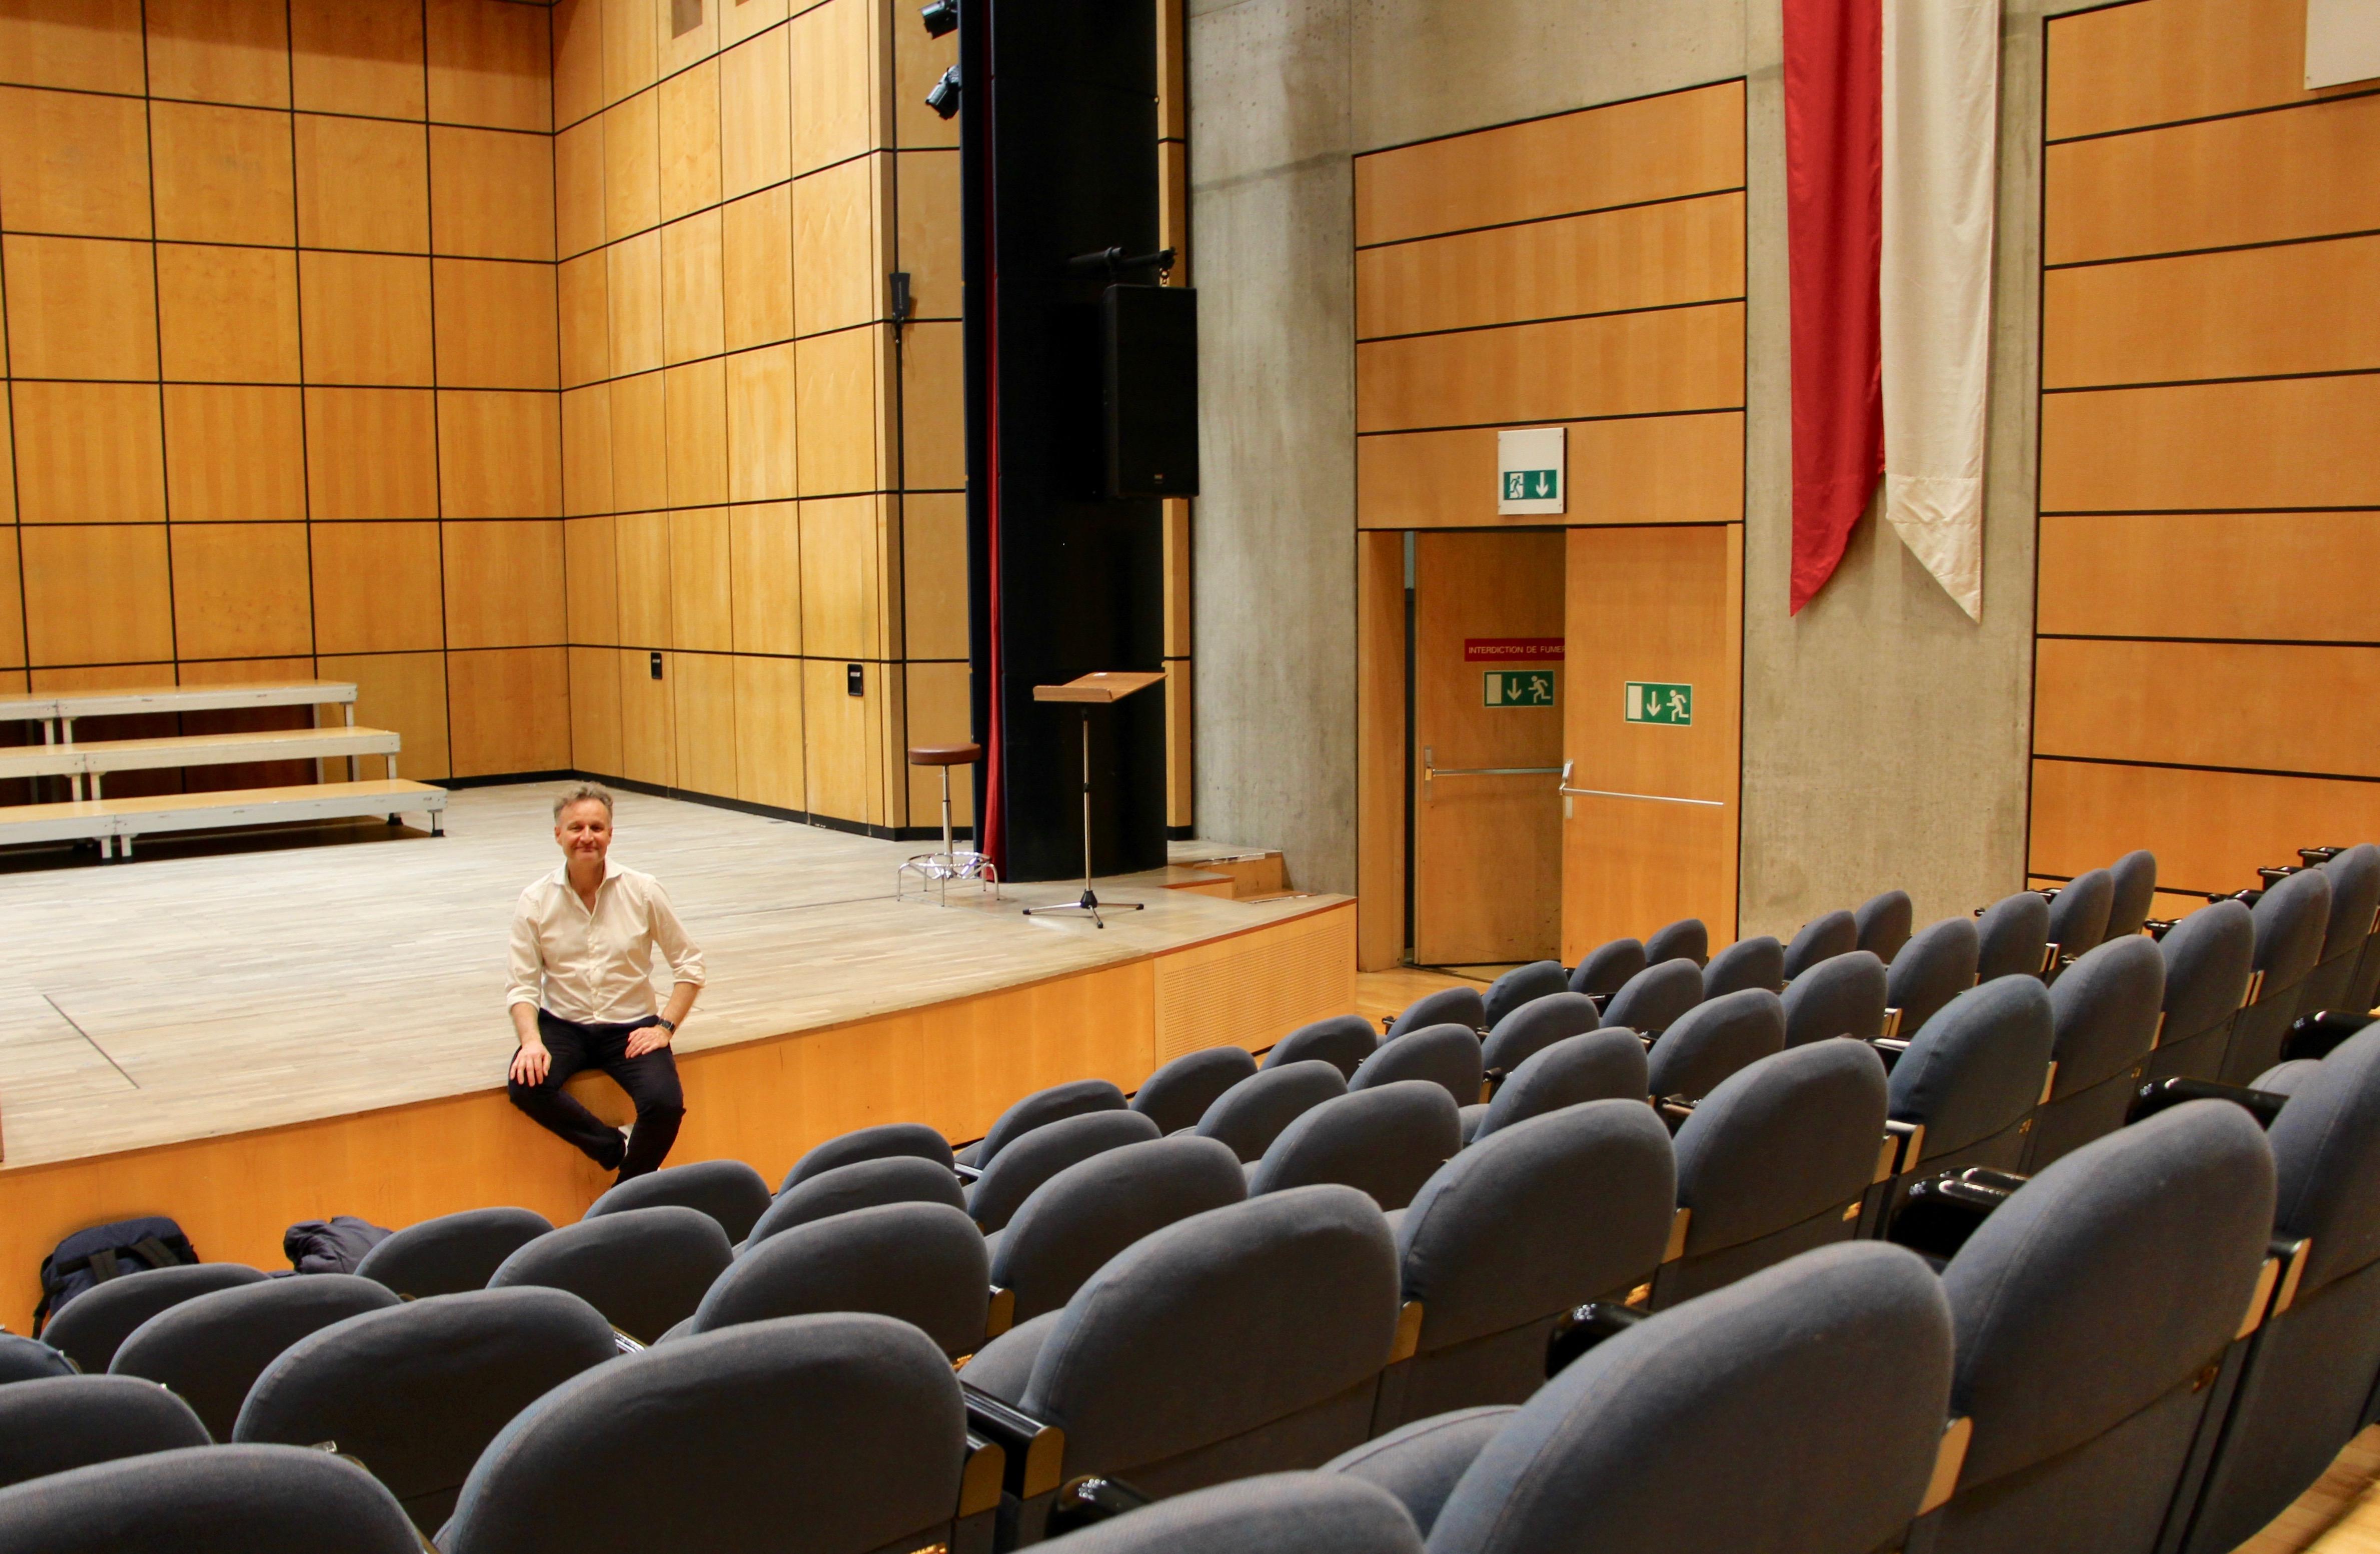 Philippe Béran à l'Aula Frank-Martin ©Eugénie Rousak